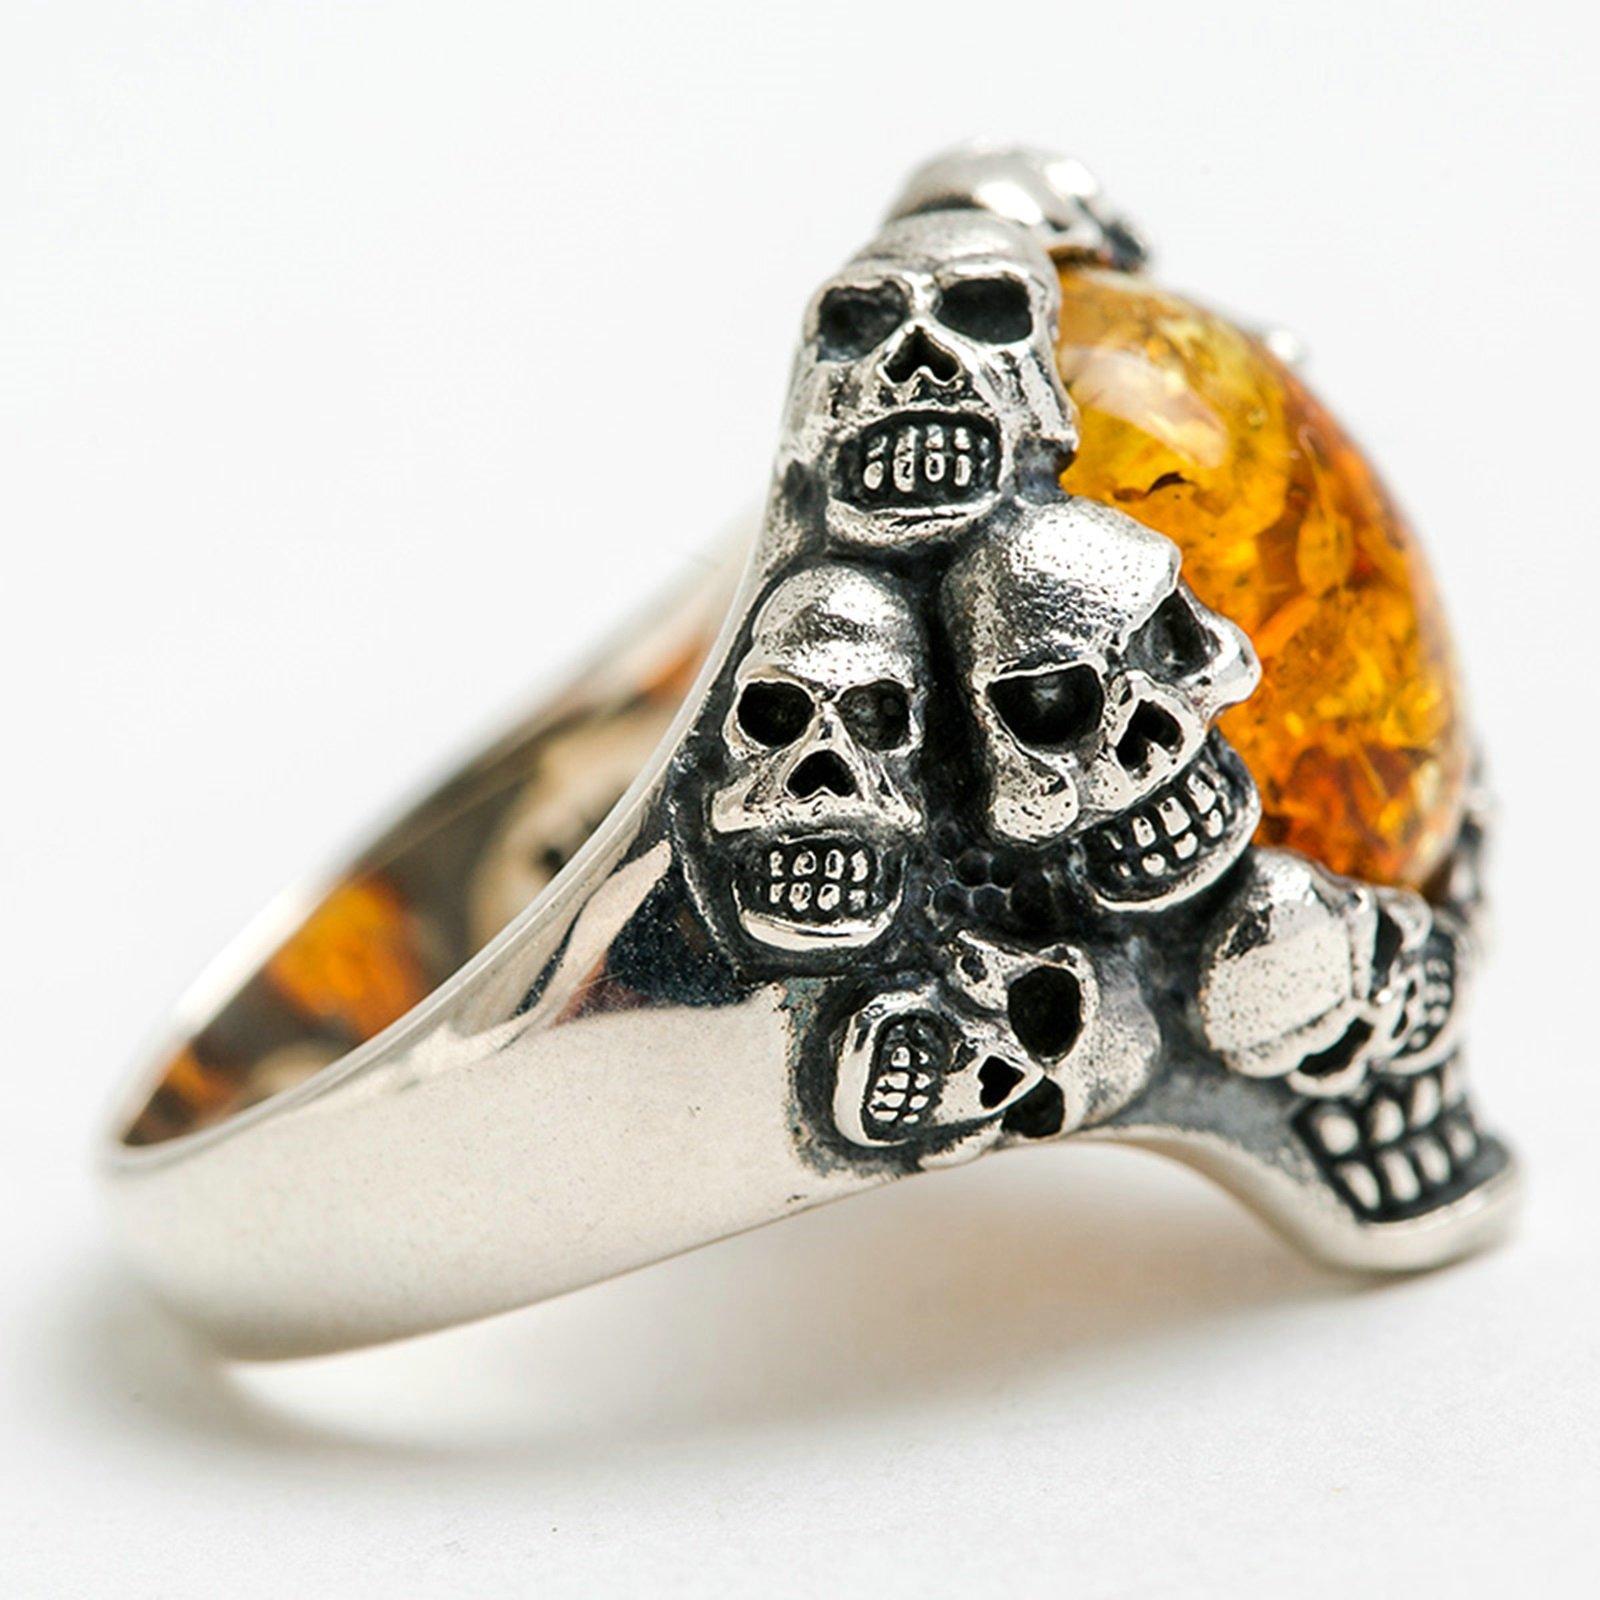 Adisaer Biker Rings Silver Ring for Men Skull Amber Ring Size 10.5 Vintage Punk Jewelry by Adisaer (Image #4)